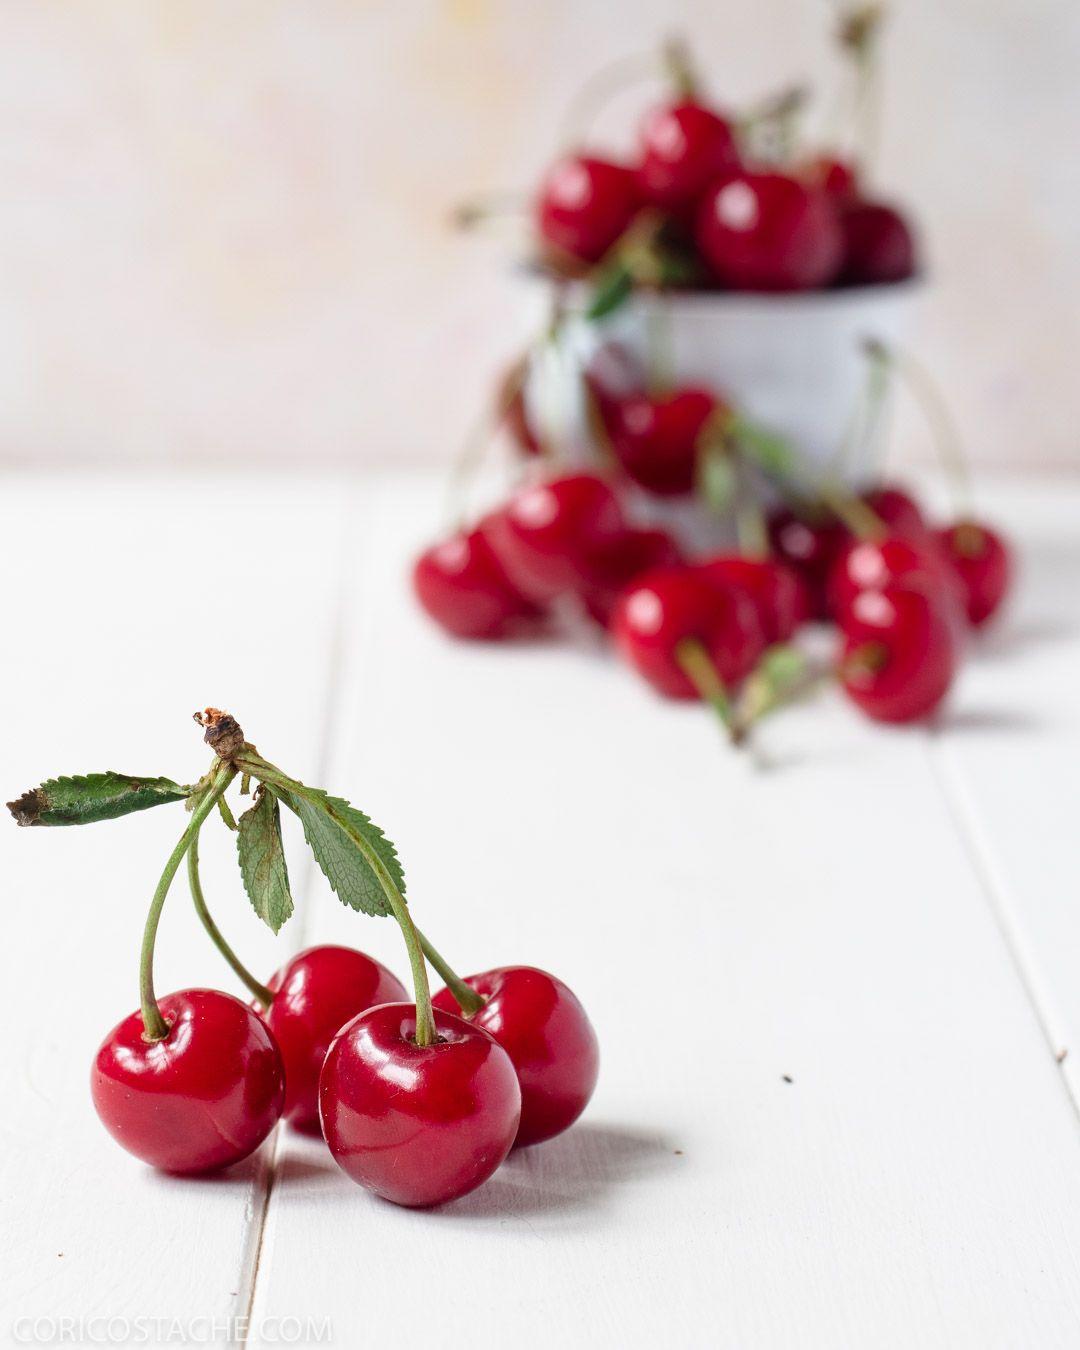 Sour Cherries Photography Spring Fruit Food Photography Honey Dessert